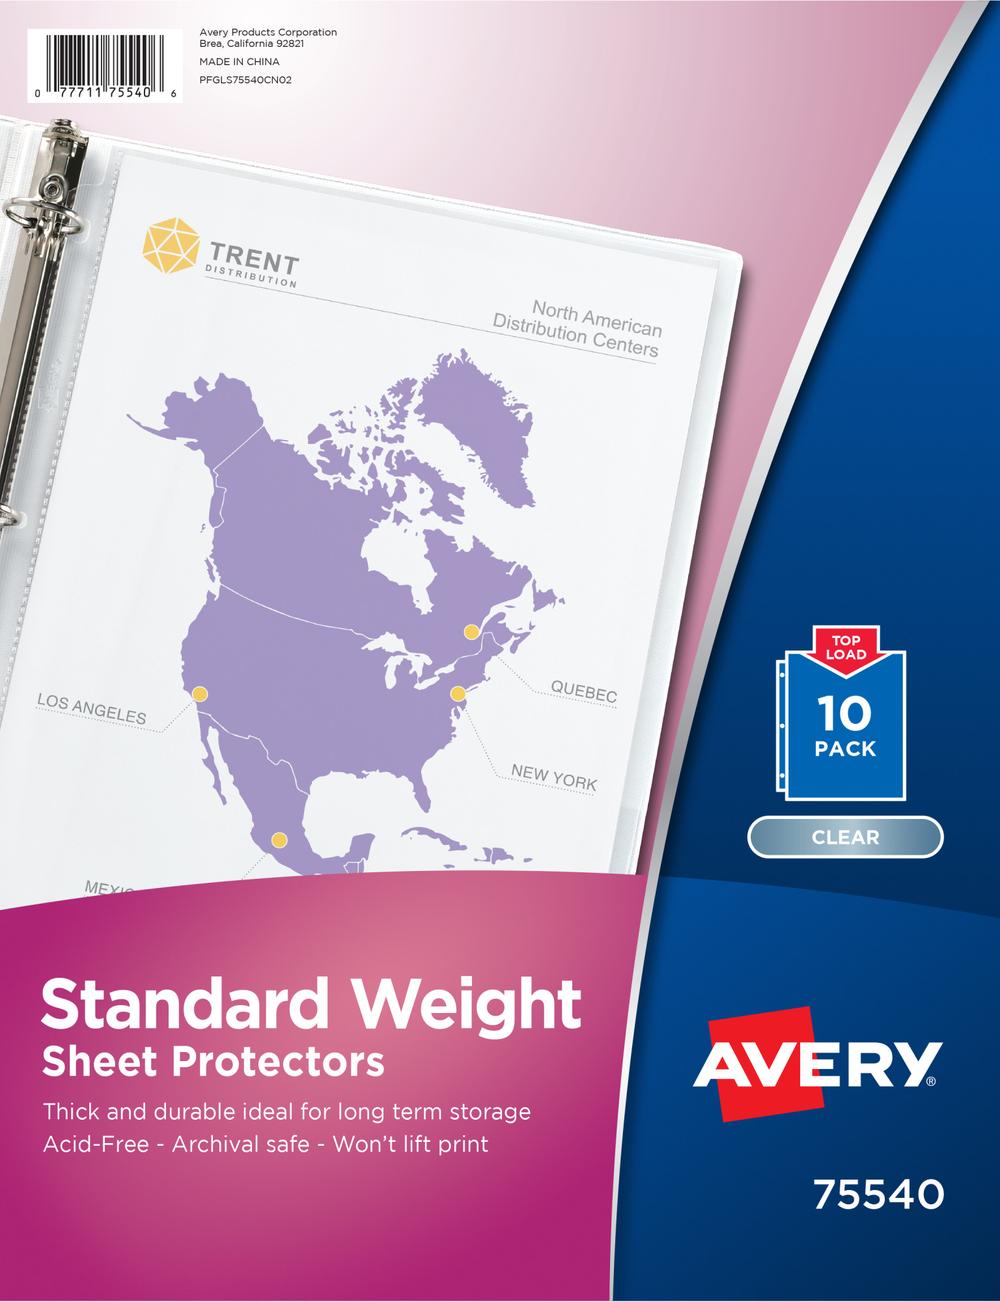 Standard Weight Sheet Protectors